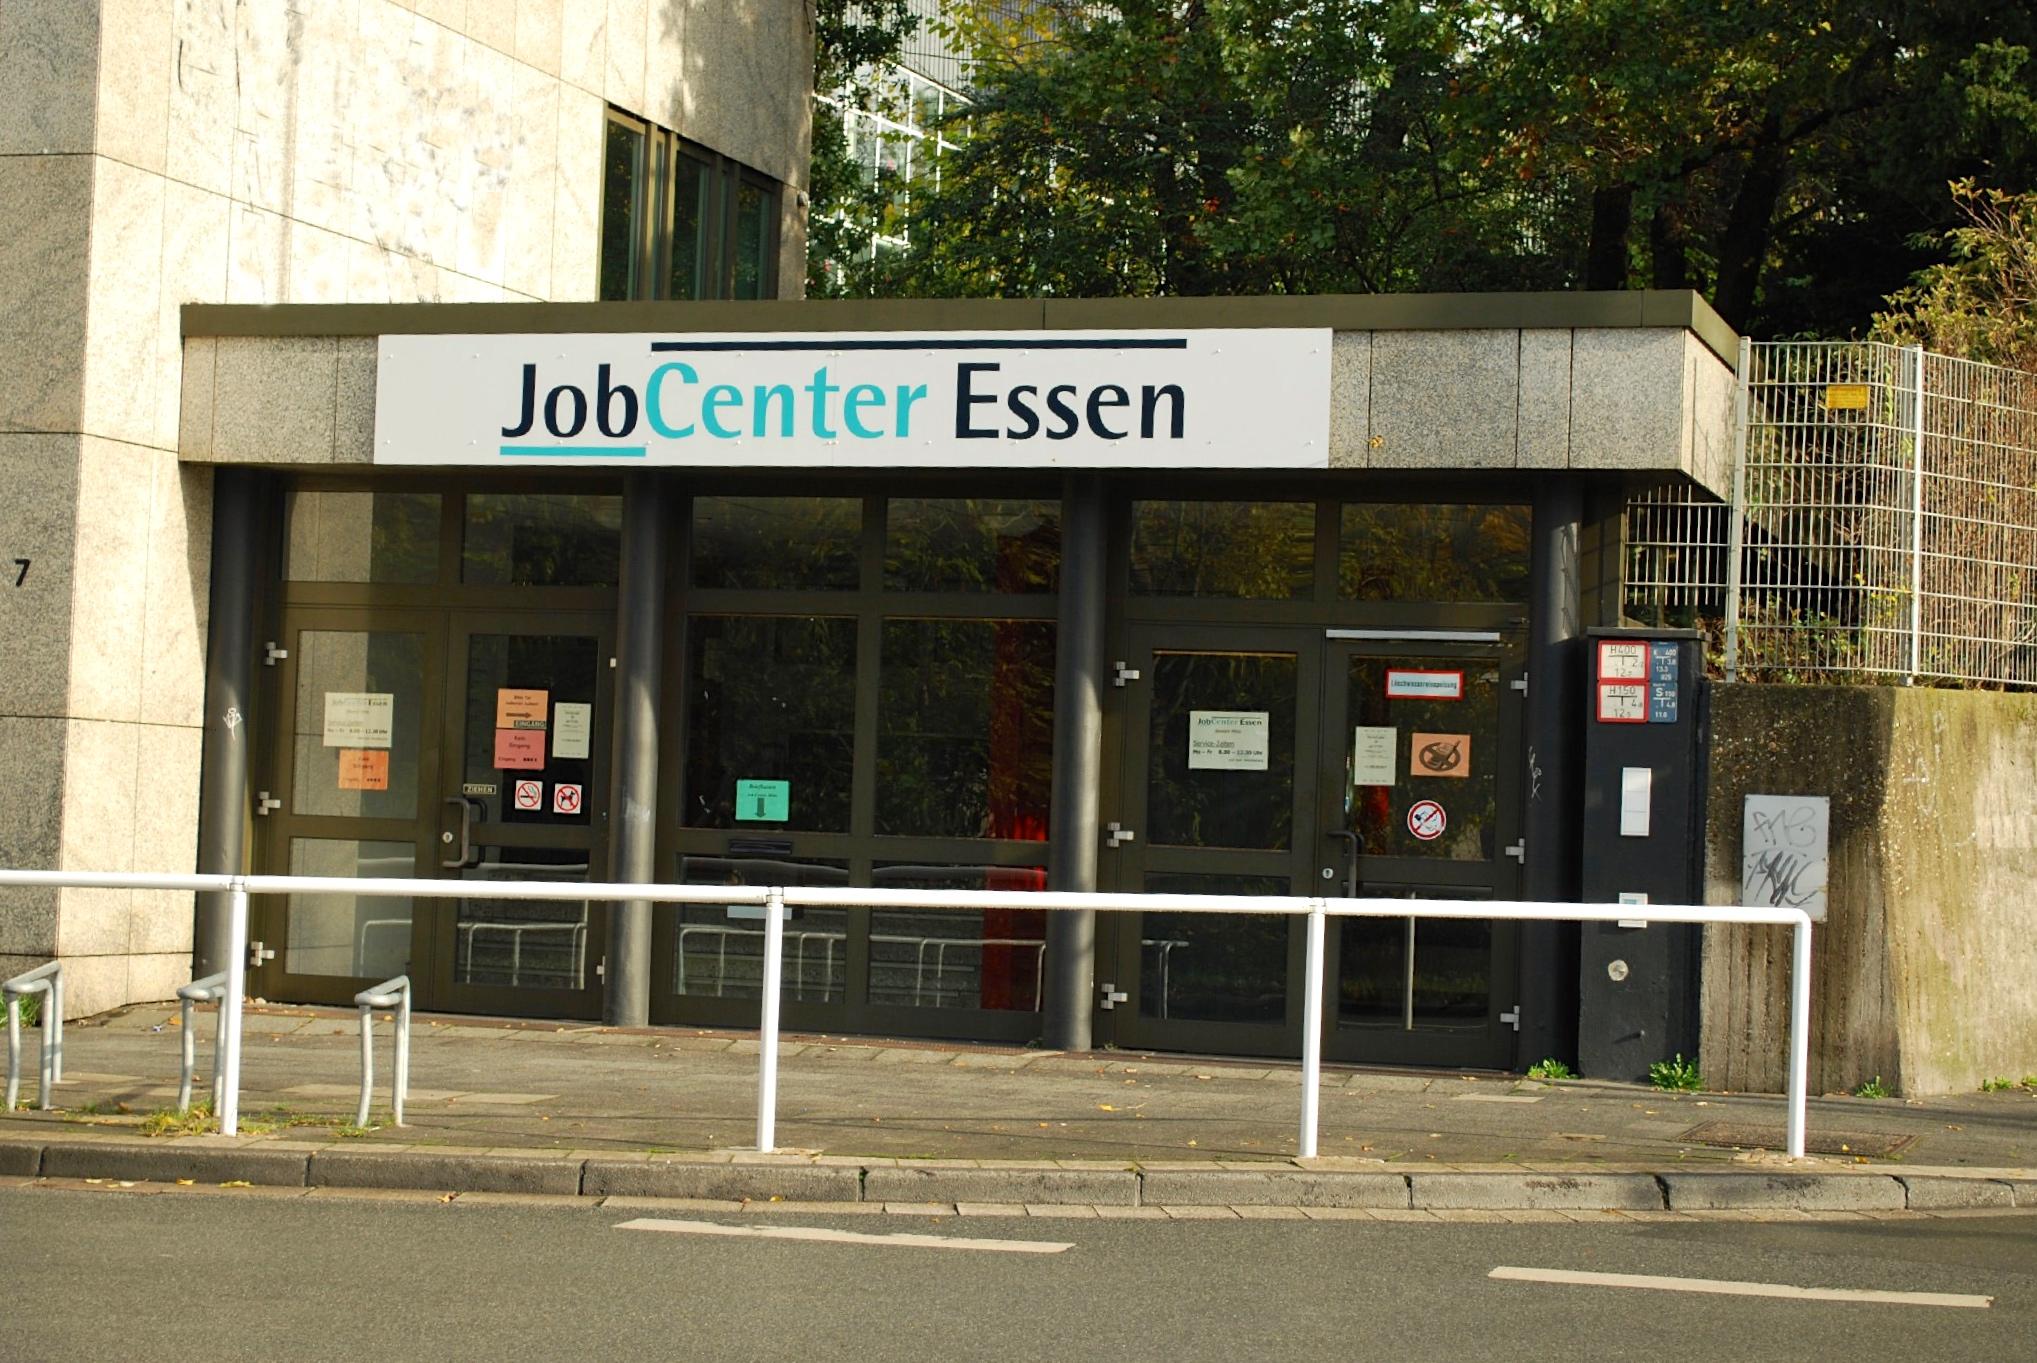 jobcenter essen berliner platz